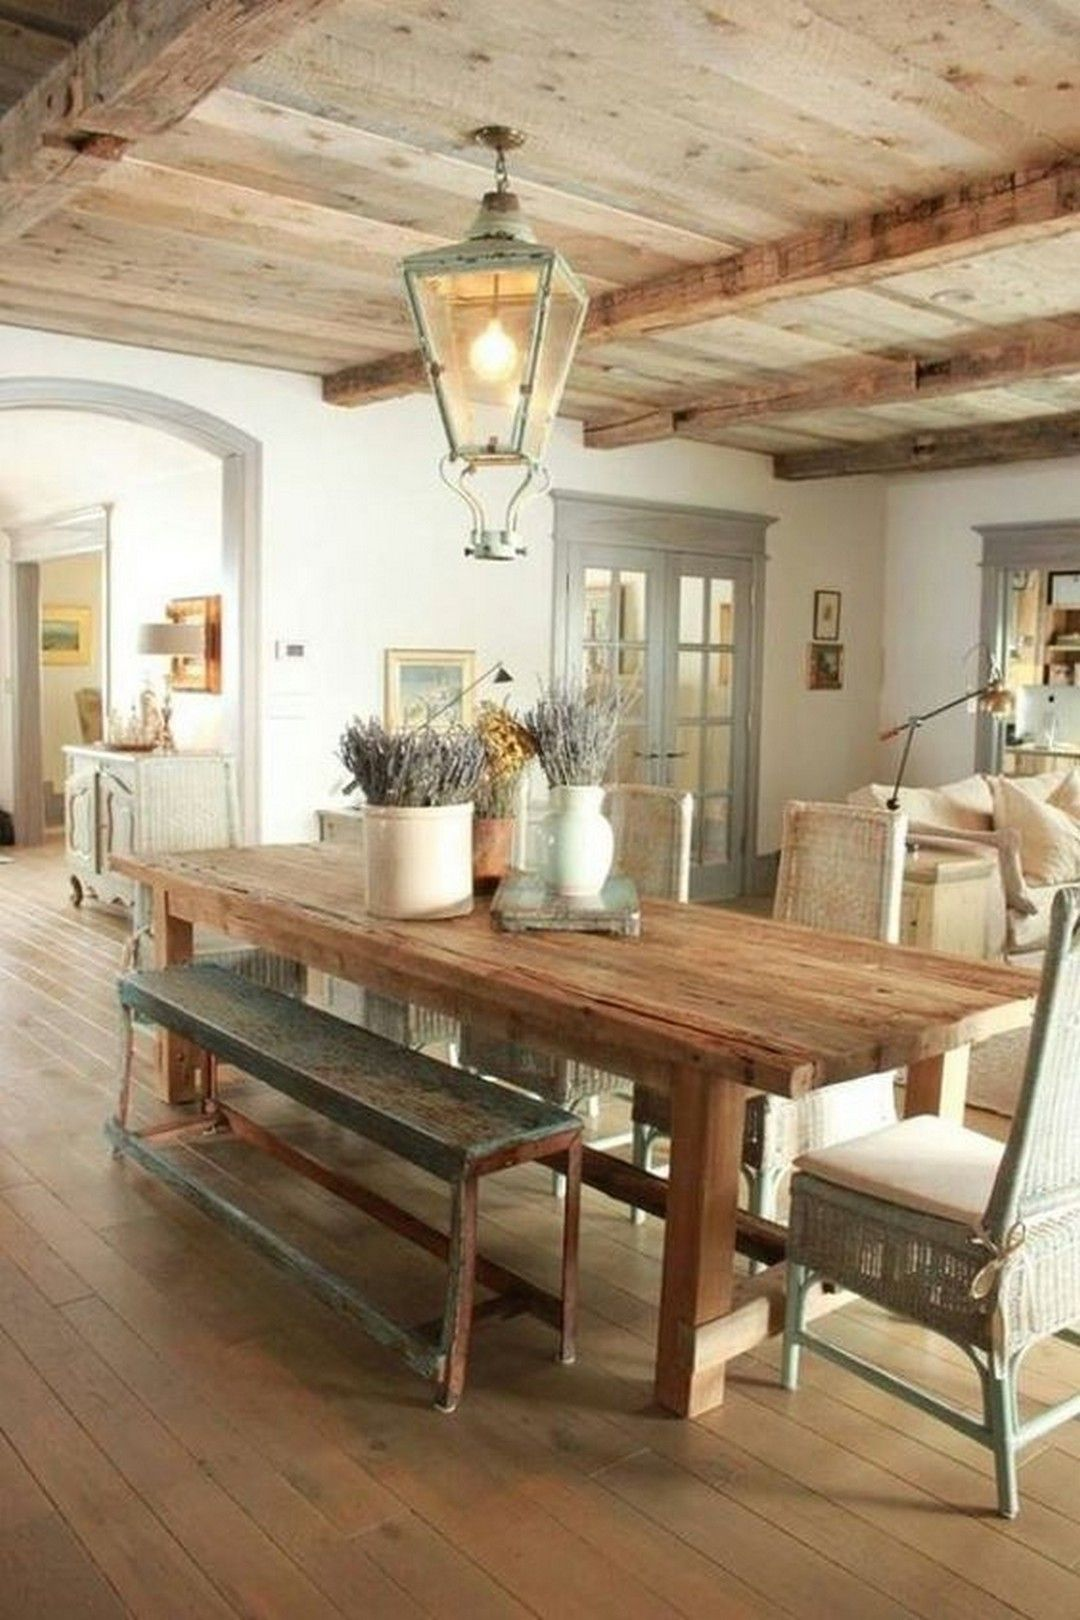 european farmhouse style and interior ideas in farmhouse